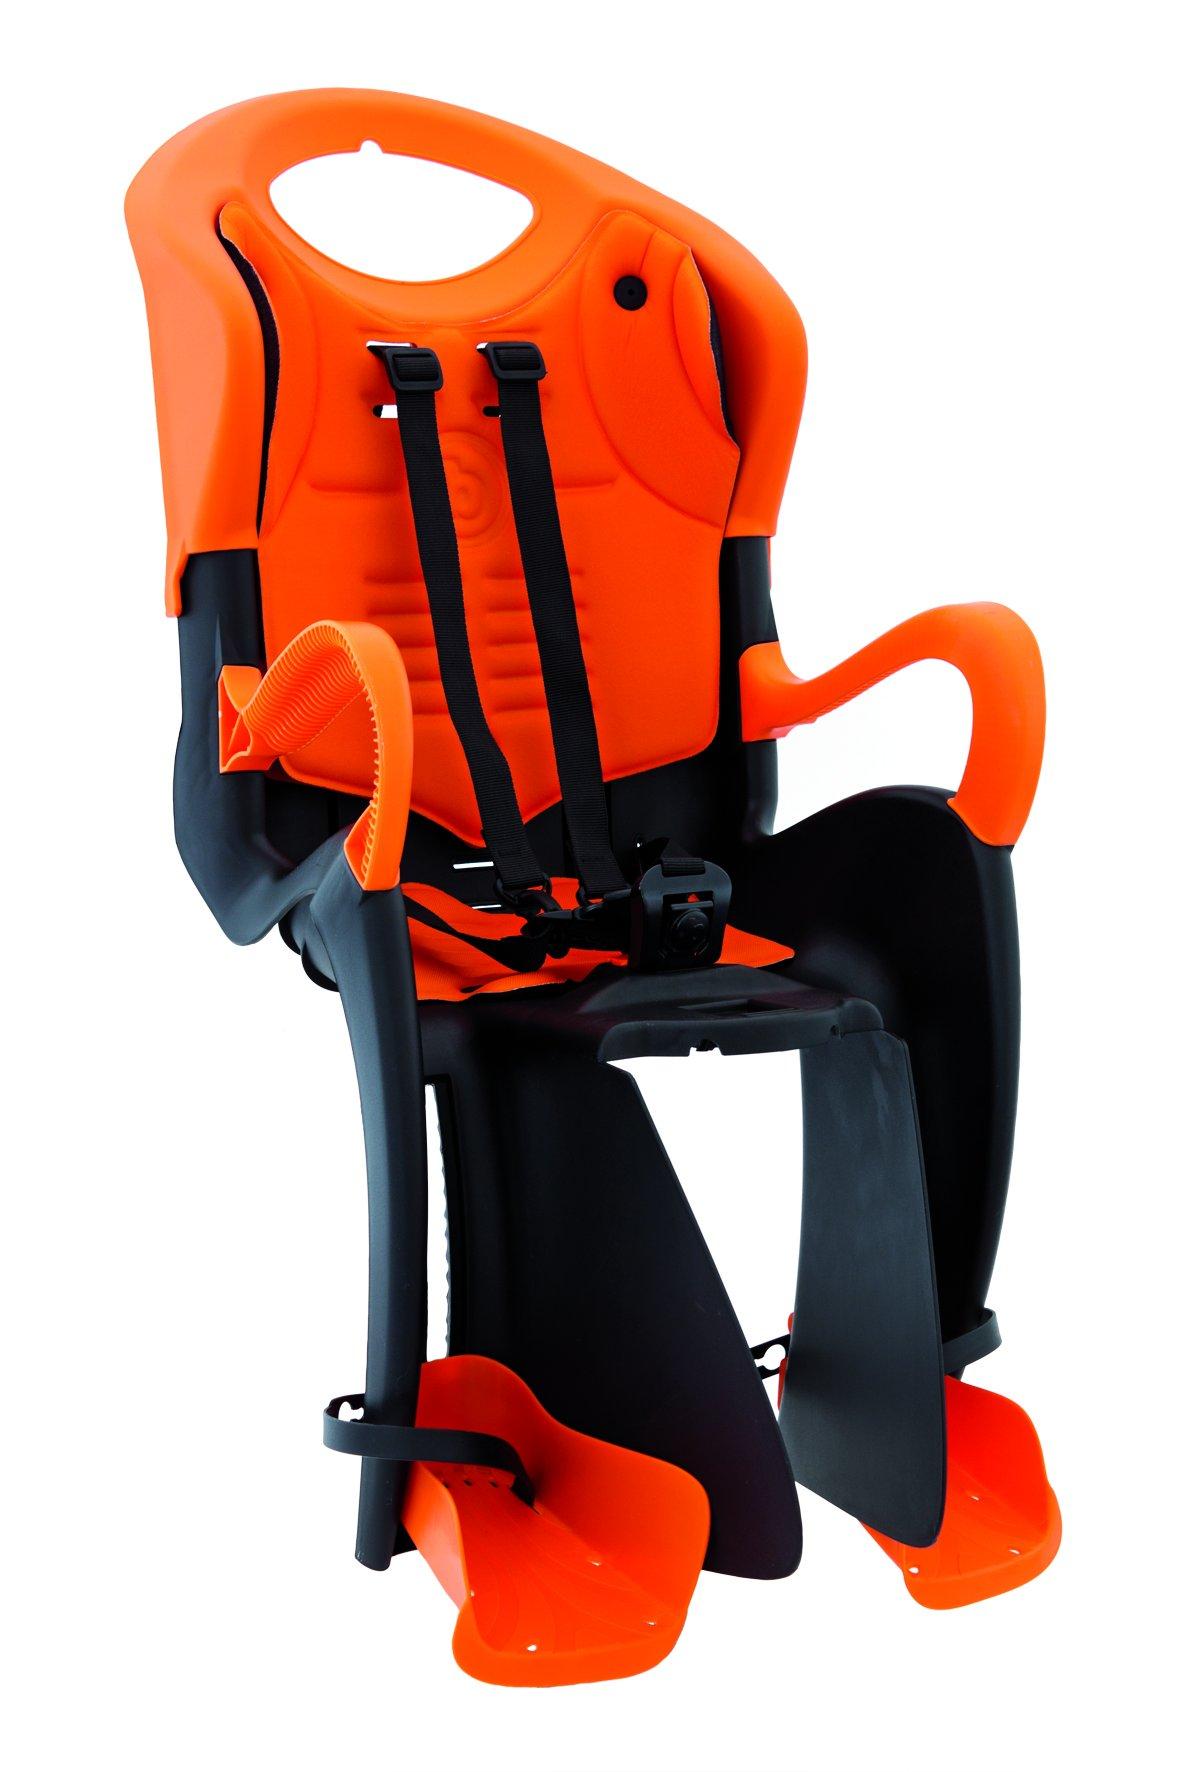 MammaCangura Tiger Standard - Rear Bike Child Seat - Italian Made with Certified Safety Standards